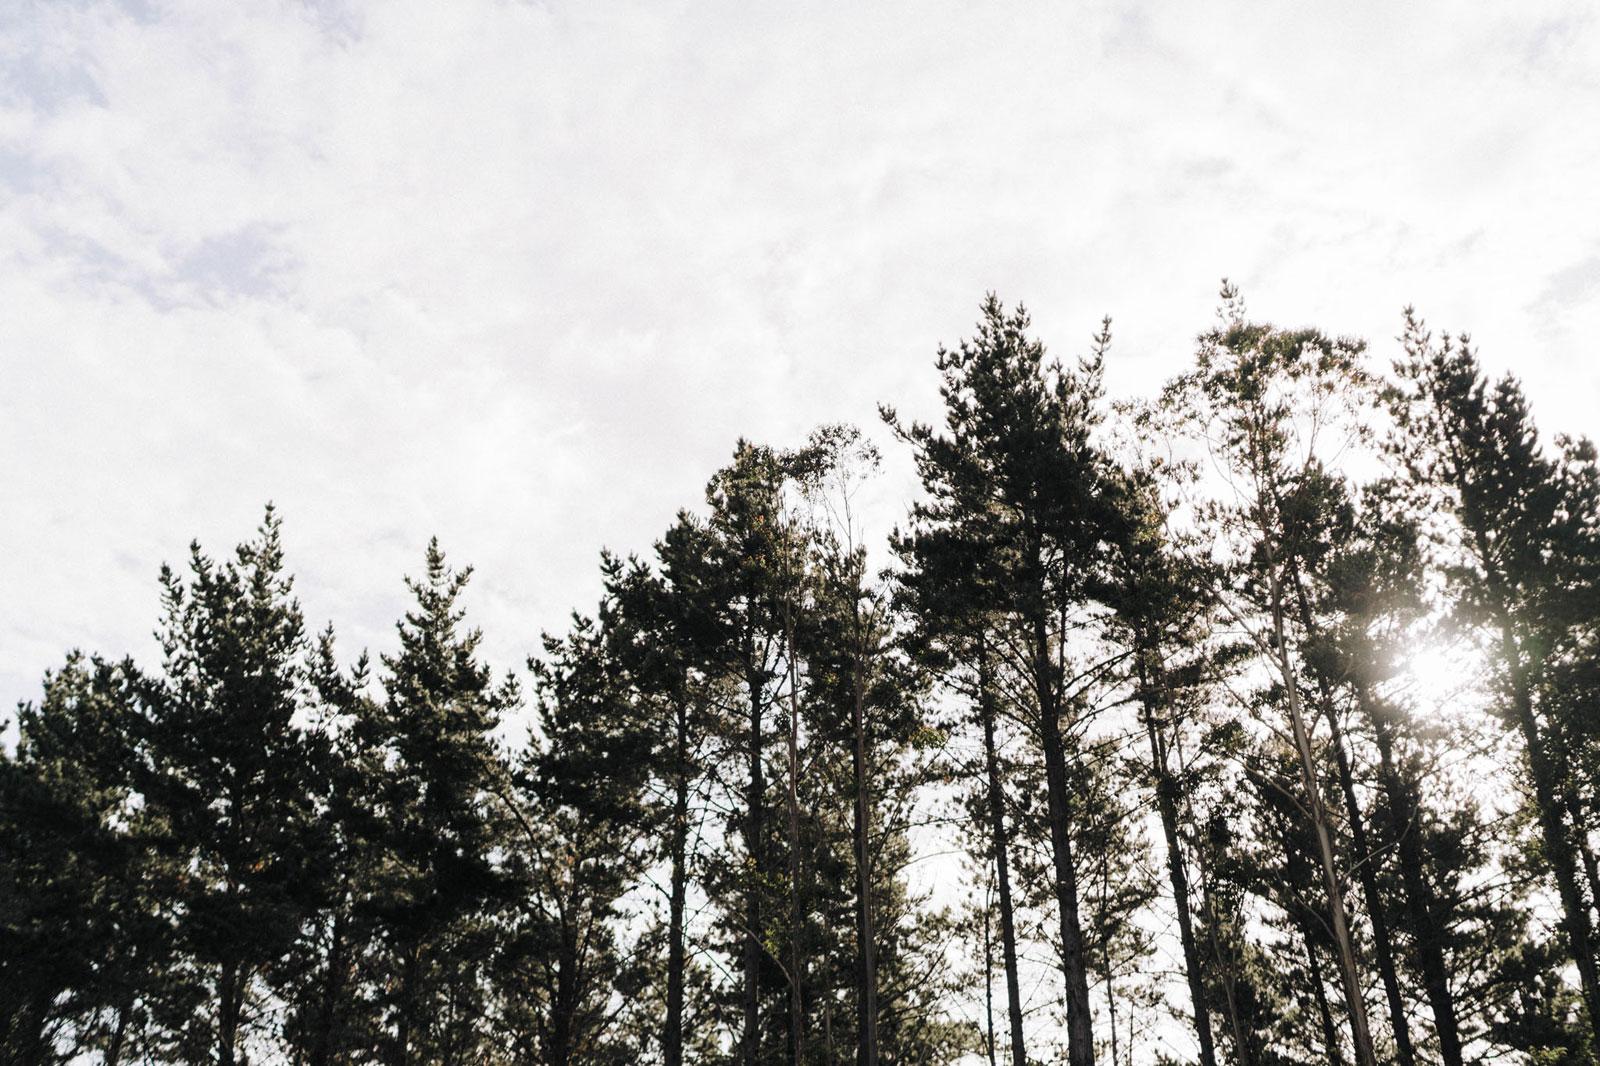 newfound-n-c-olive-tree-cottage-tauranga-wedding-photographer-914